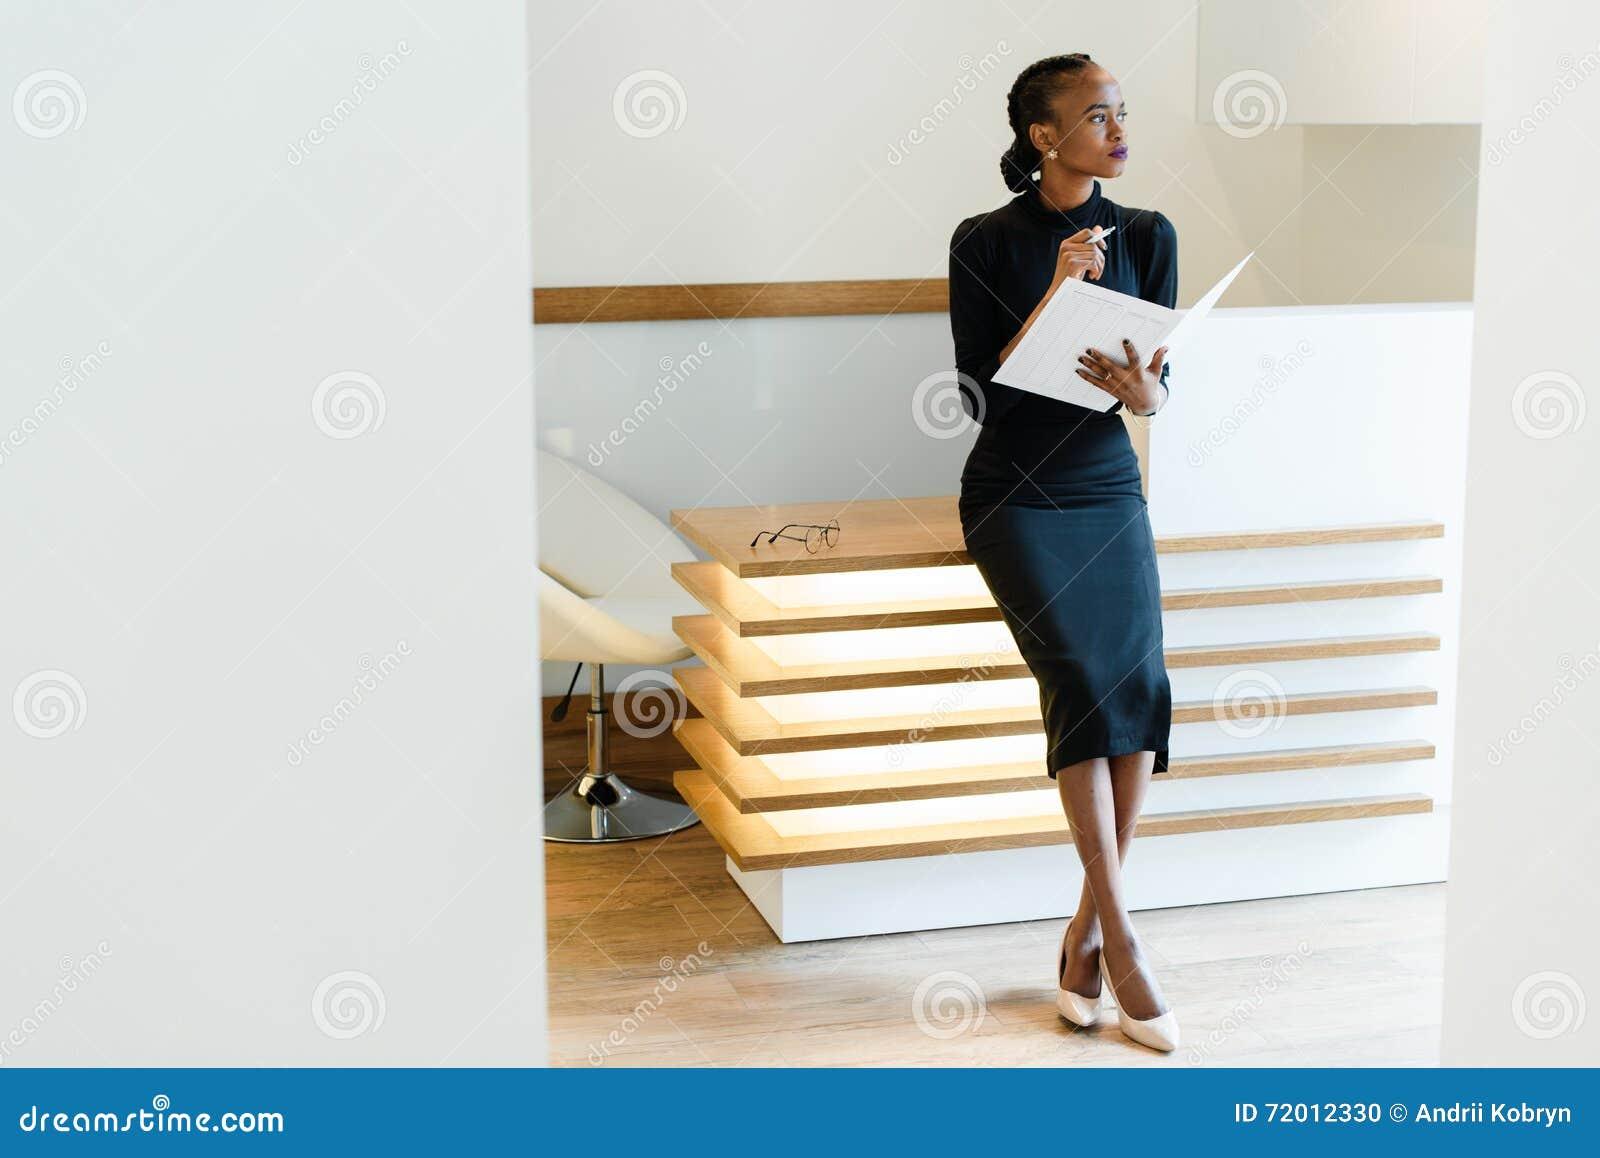 Vestido negro zapatos beige